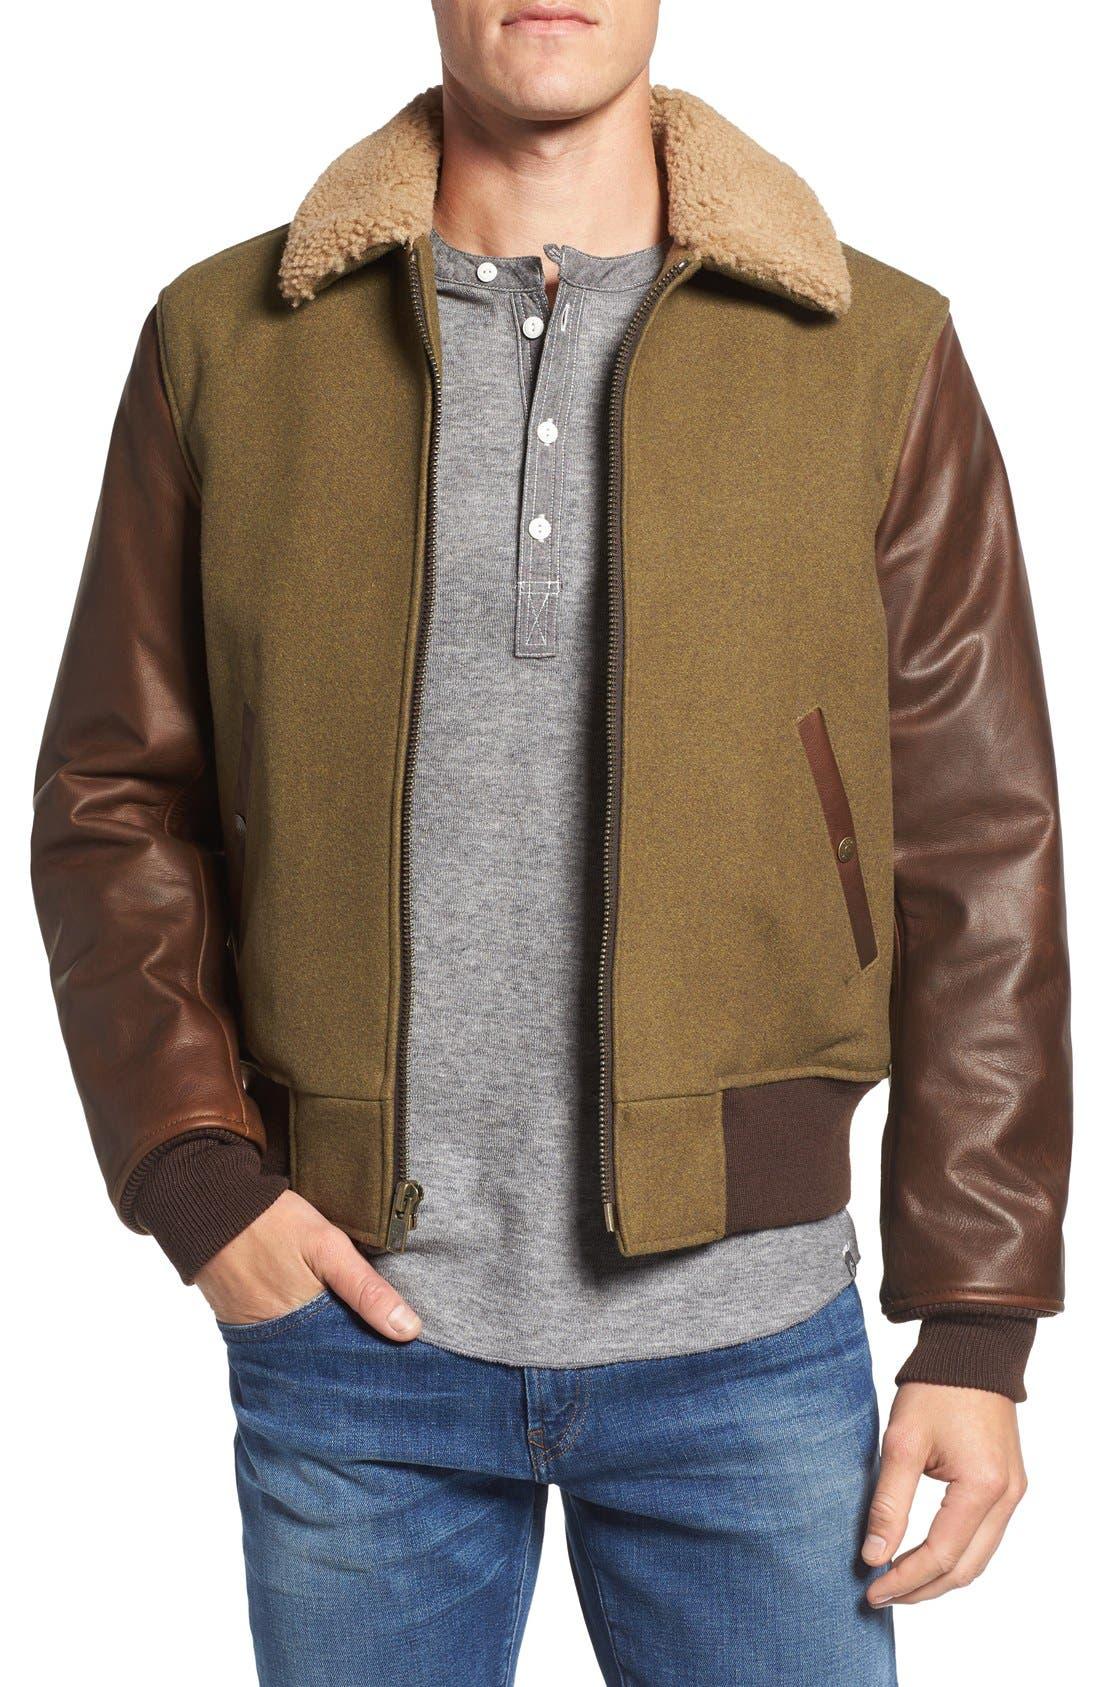 Mixed Media B-15 Flight Jacket with Genuine Shearling Collar,                             Main thumbnail 1, color,